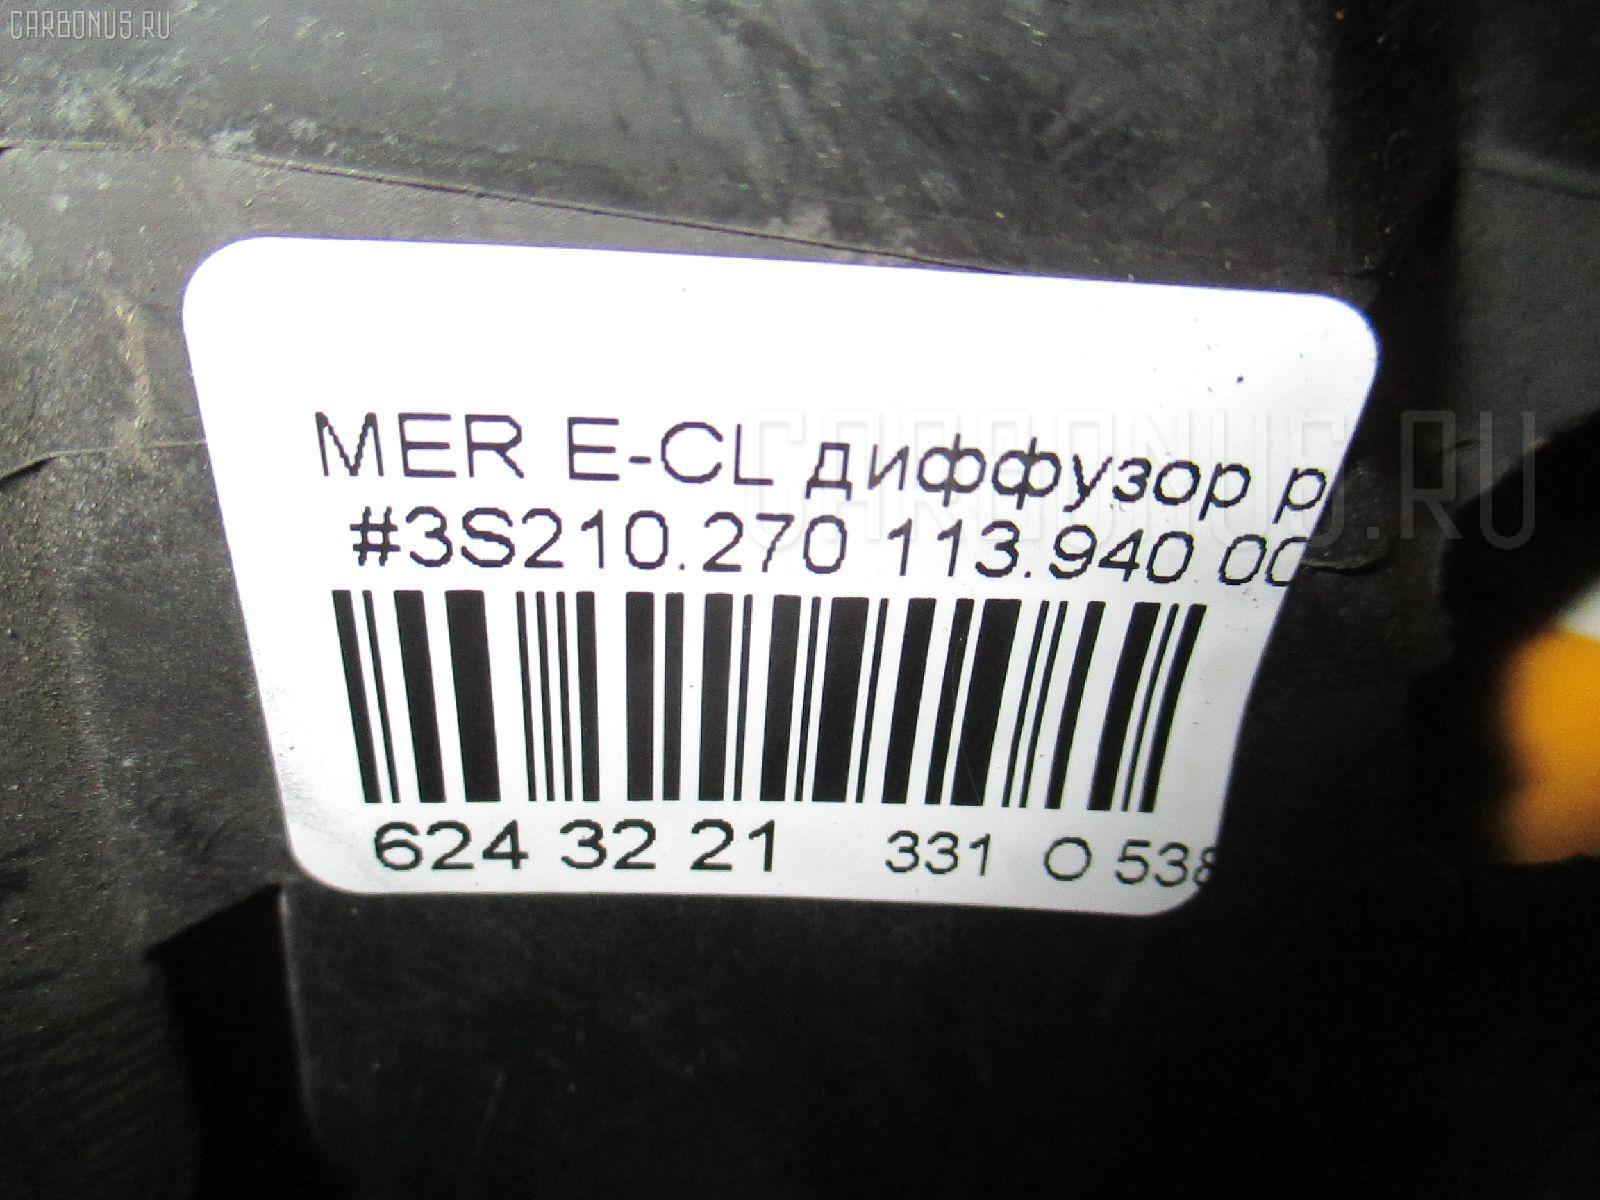 Воздухозаборник MERCEDES-BENZ E-CLASS STATION WAGON S210.270 113.940 Фото 8